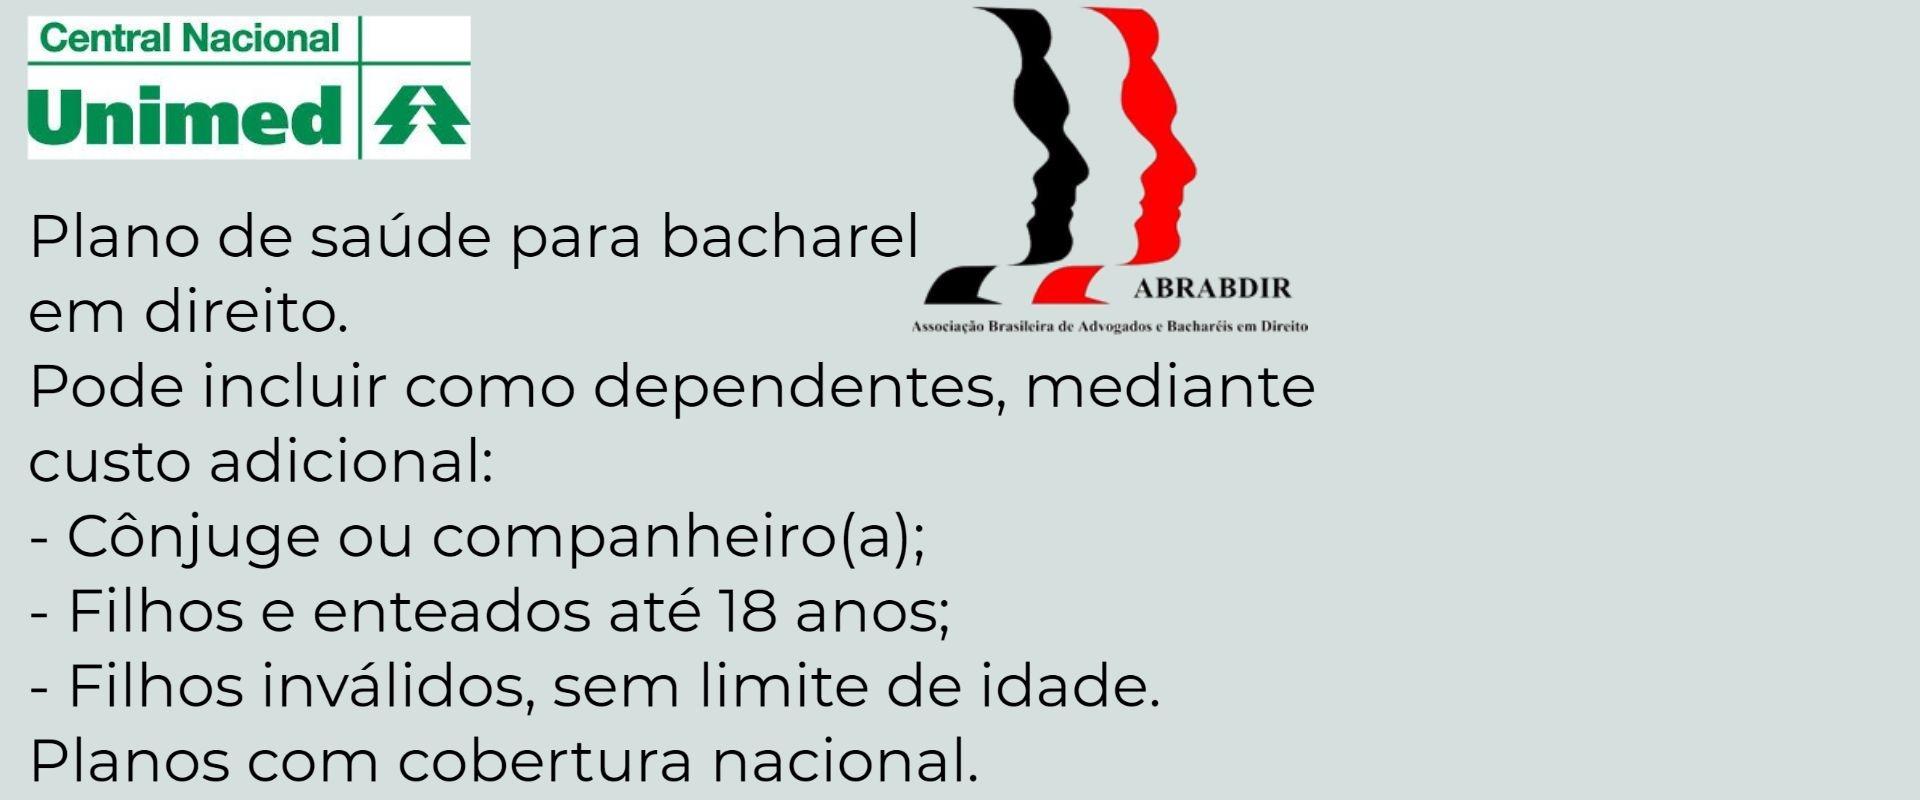 Unimed ABRABDIR Fernandópolis